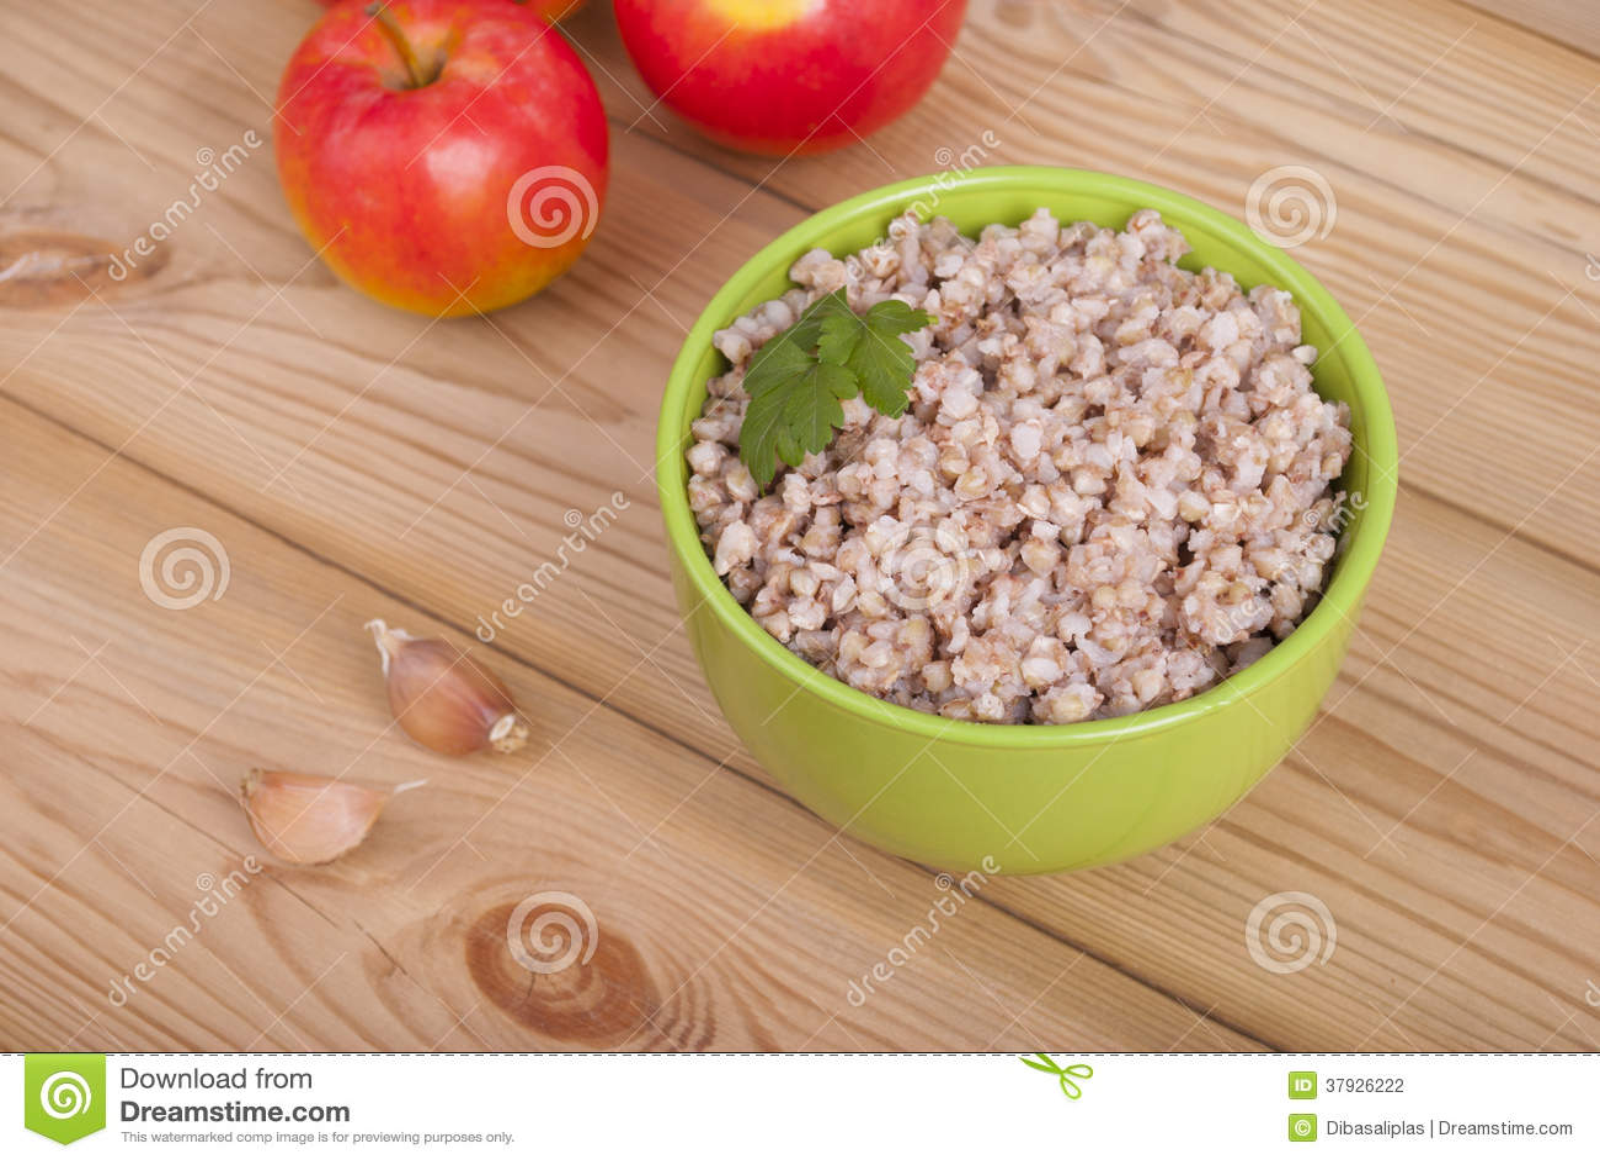 Buckwheat and apples.